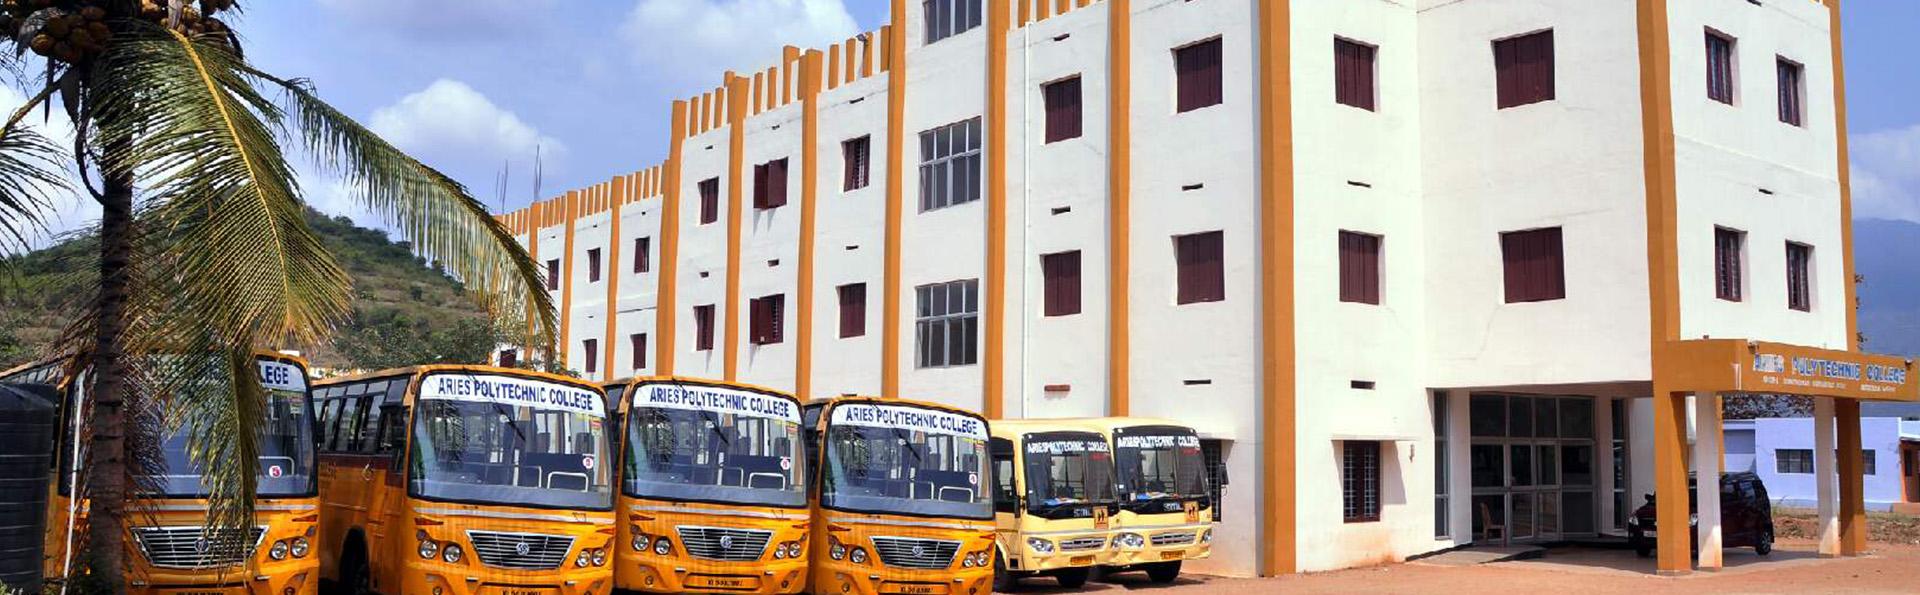 Aries Polytechnic College